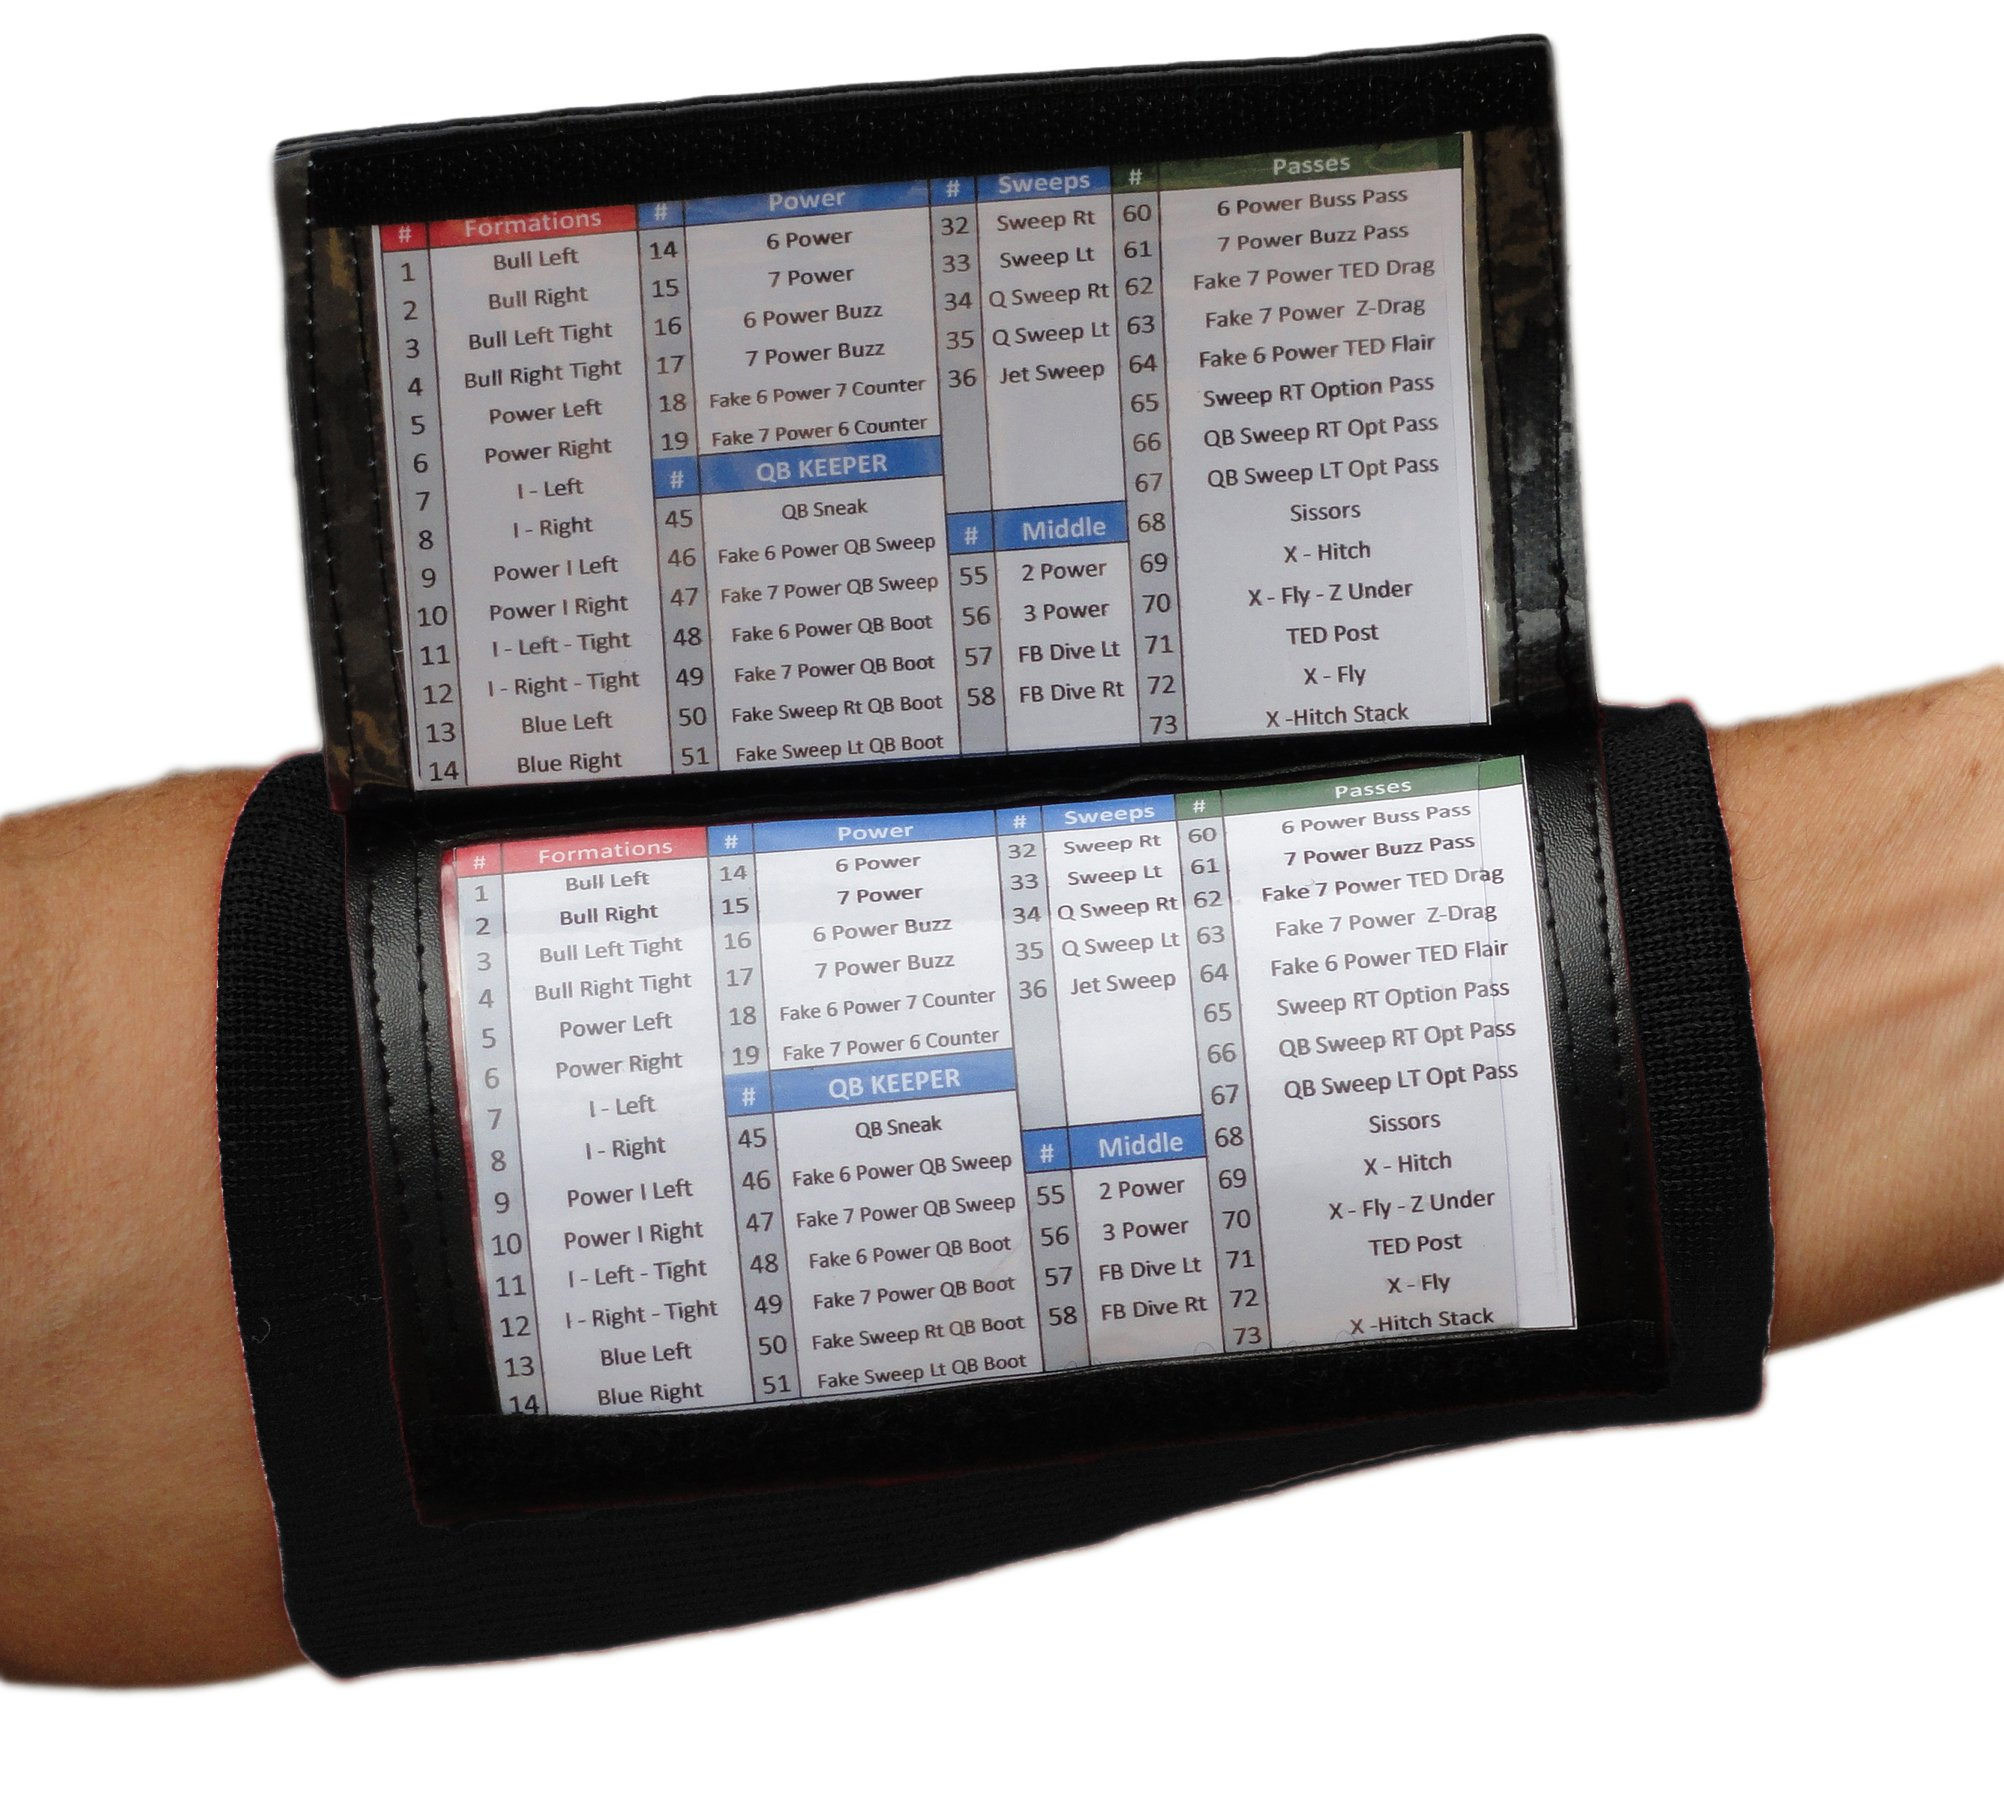 SteelLocker Sports X200 Adult Playbook Wristband - 10 Pack (Black)